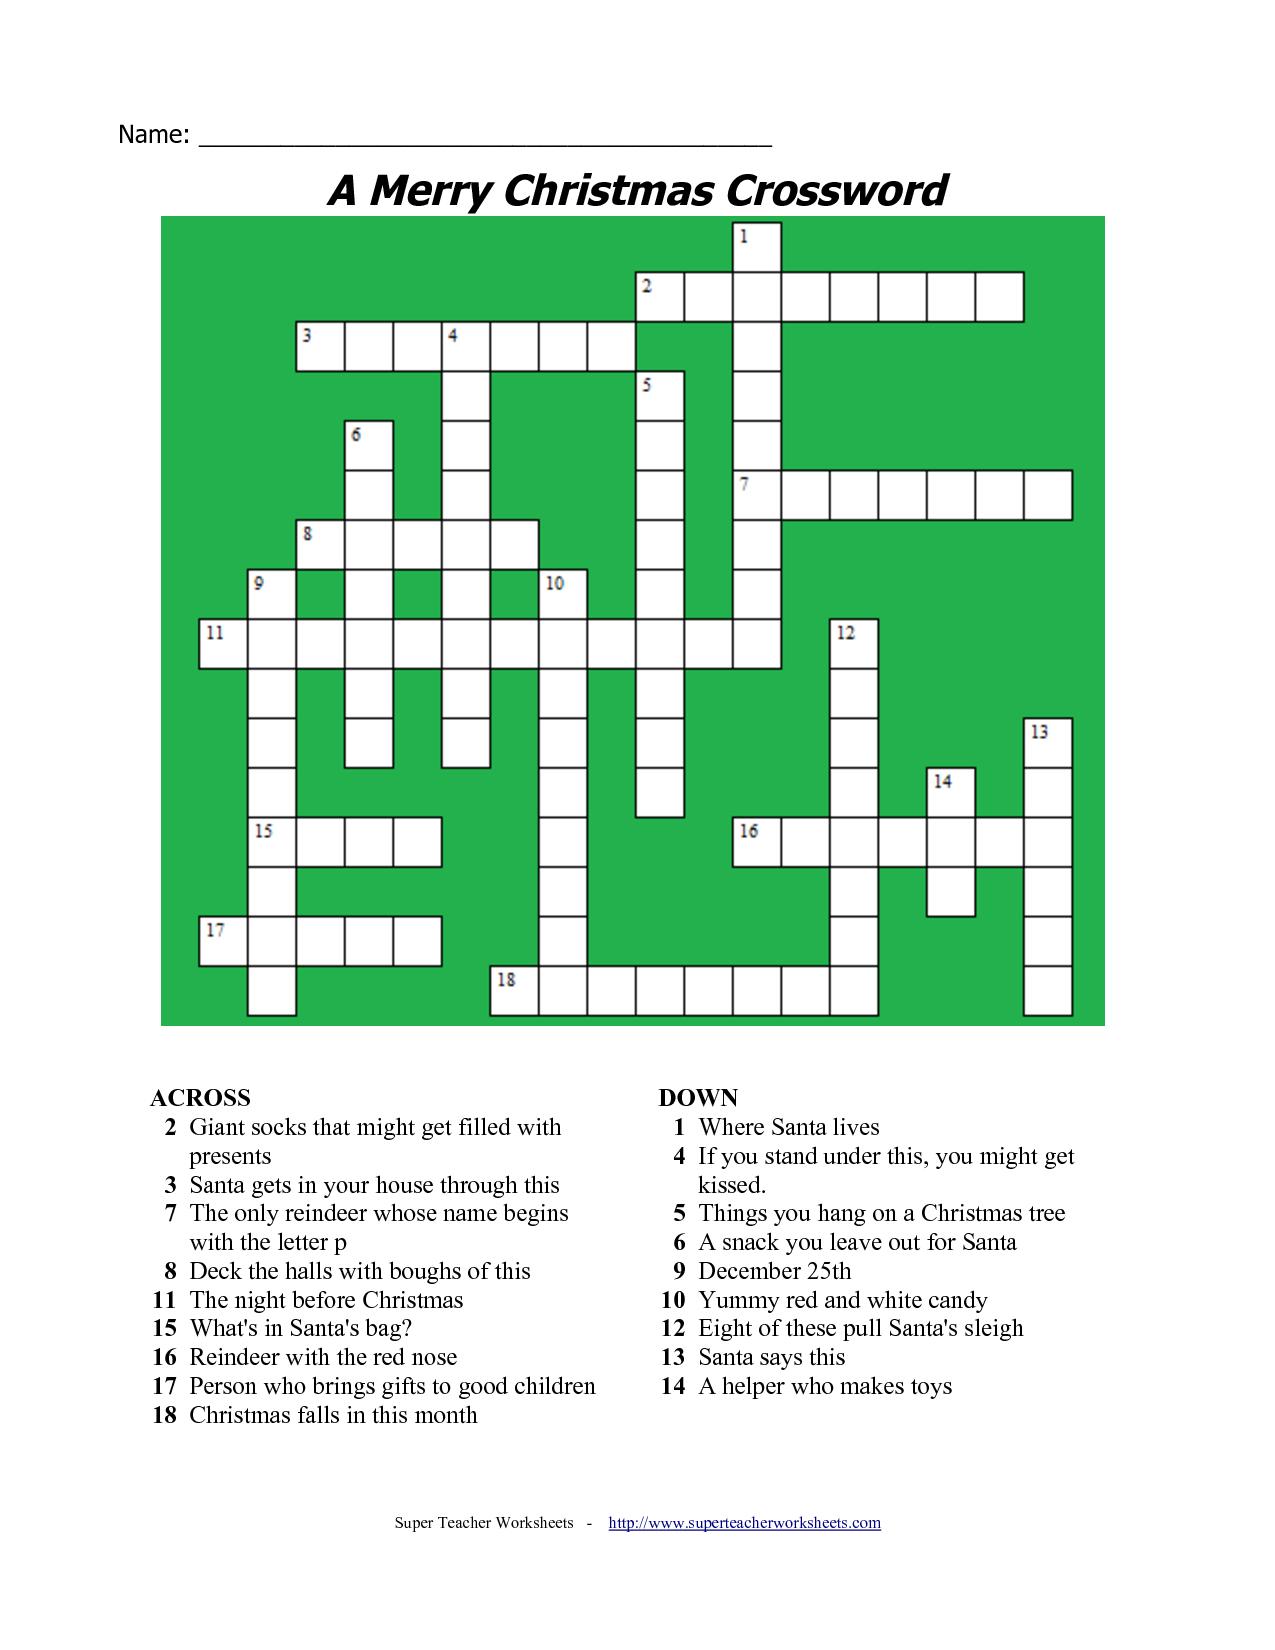 20 Fun Printable Christmas Crossword Puzzles | Kittybabylove - Printable Christmas Crossword Puzzles With Answers